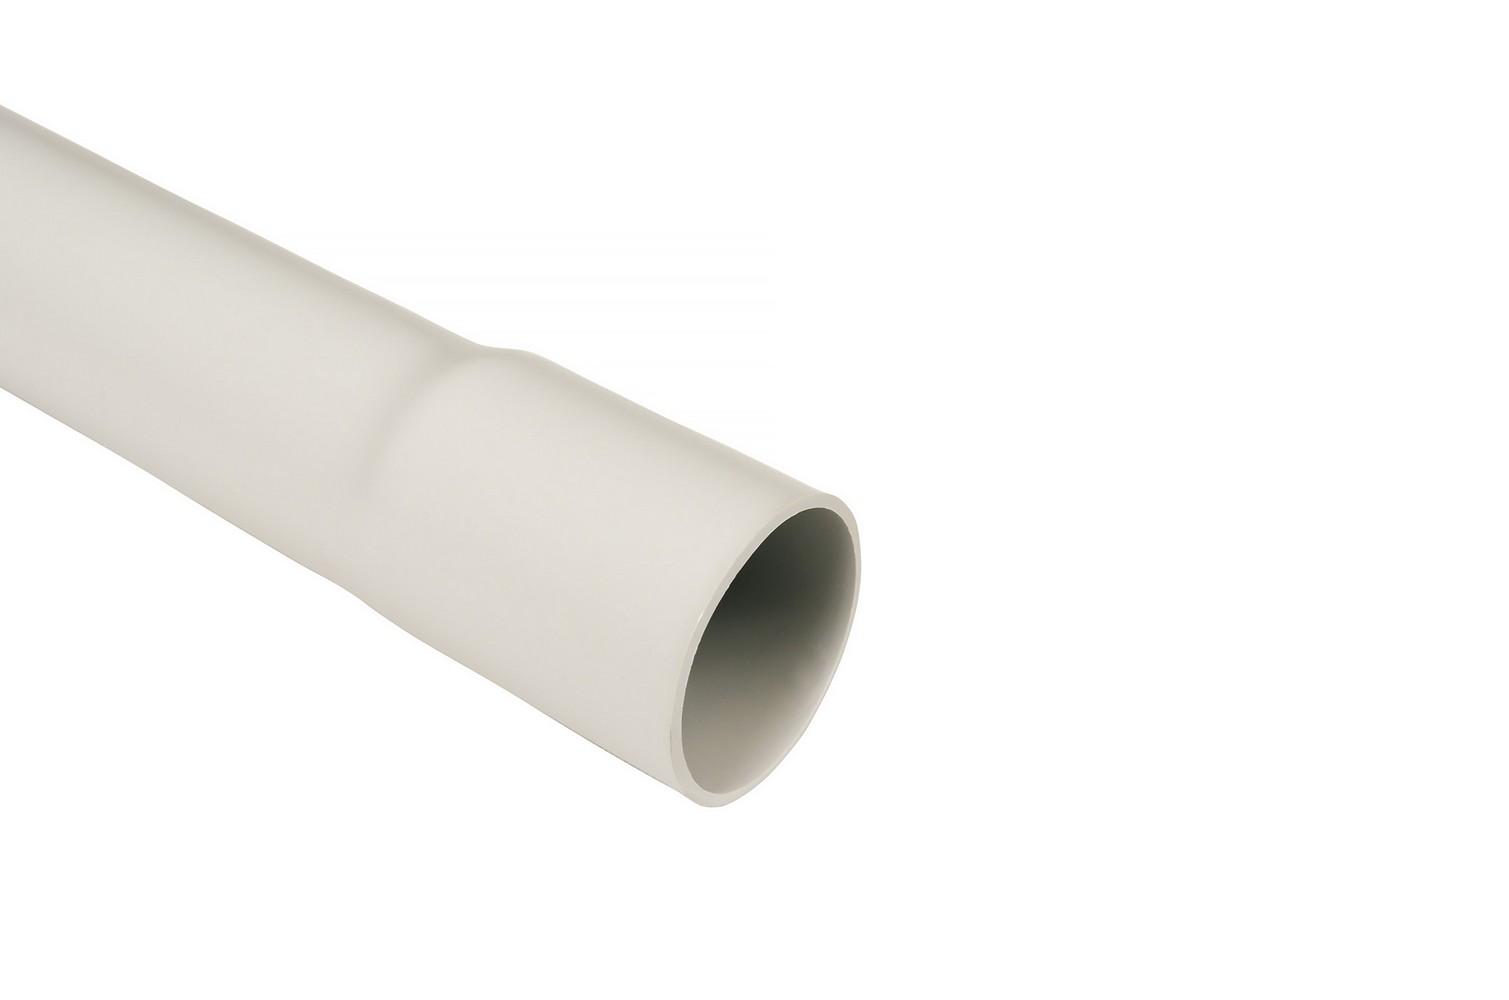 Trubka tuhá hrdlovaná PVC 320 N pr. 25 mm (3m)